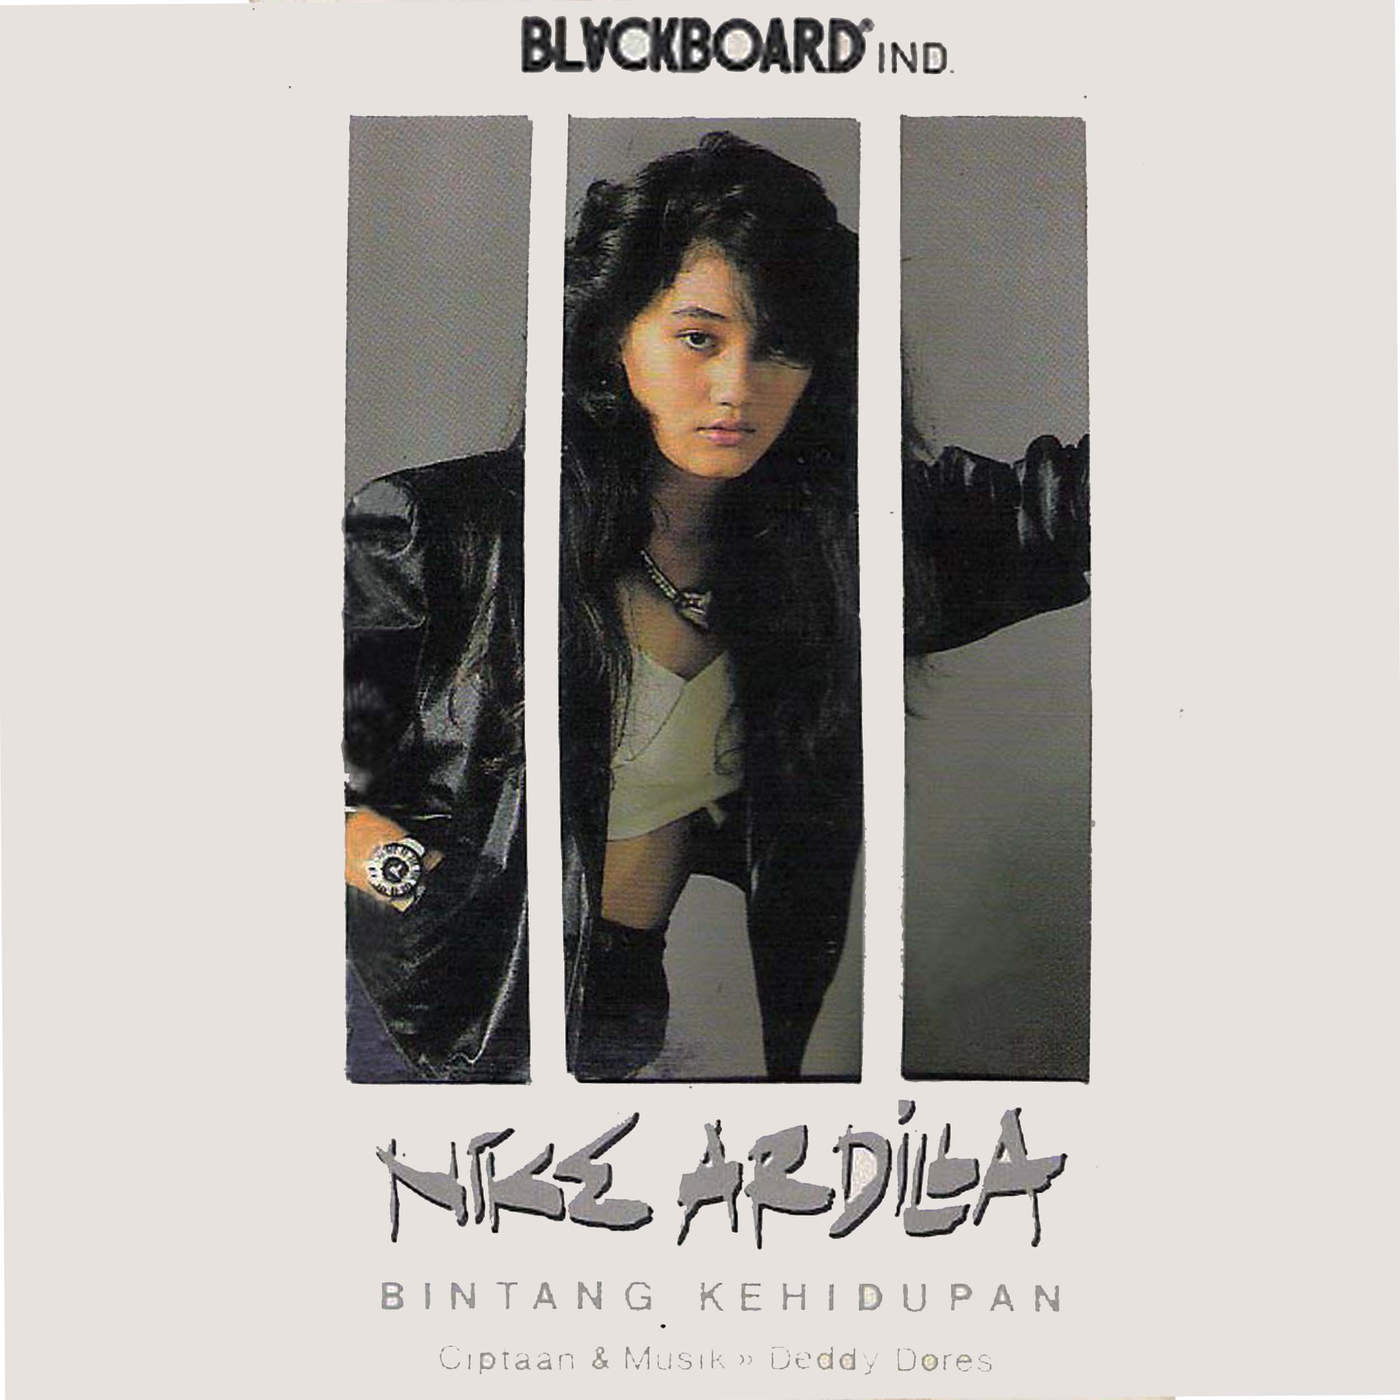 Nike Ardilla - Bintang Kehidupan - Album (1990) [iTunes Plus AAC M4A]